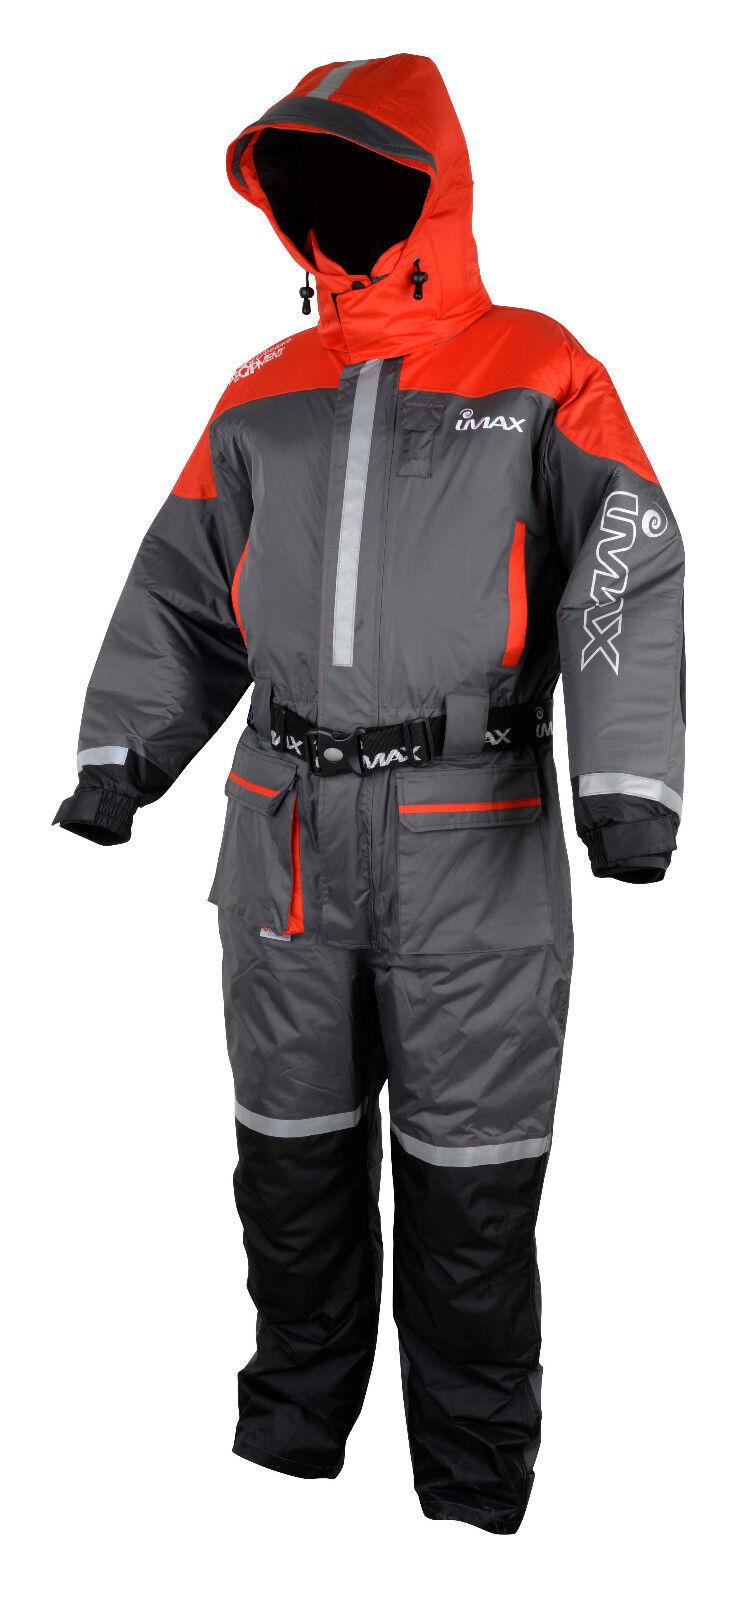 IMAX Ocean FLOATATION Suit 1Divisorio floatinganzug COSTUMONE nuoto Floater